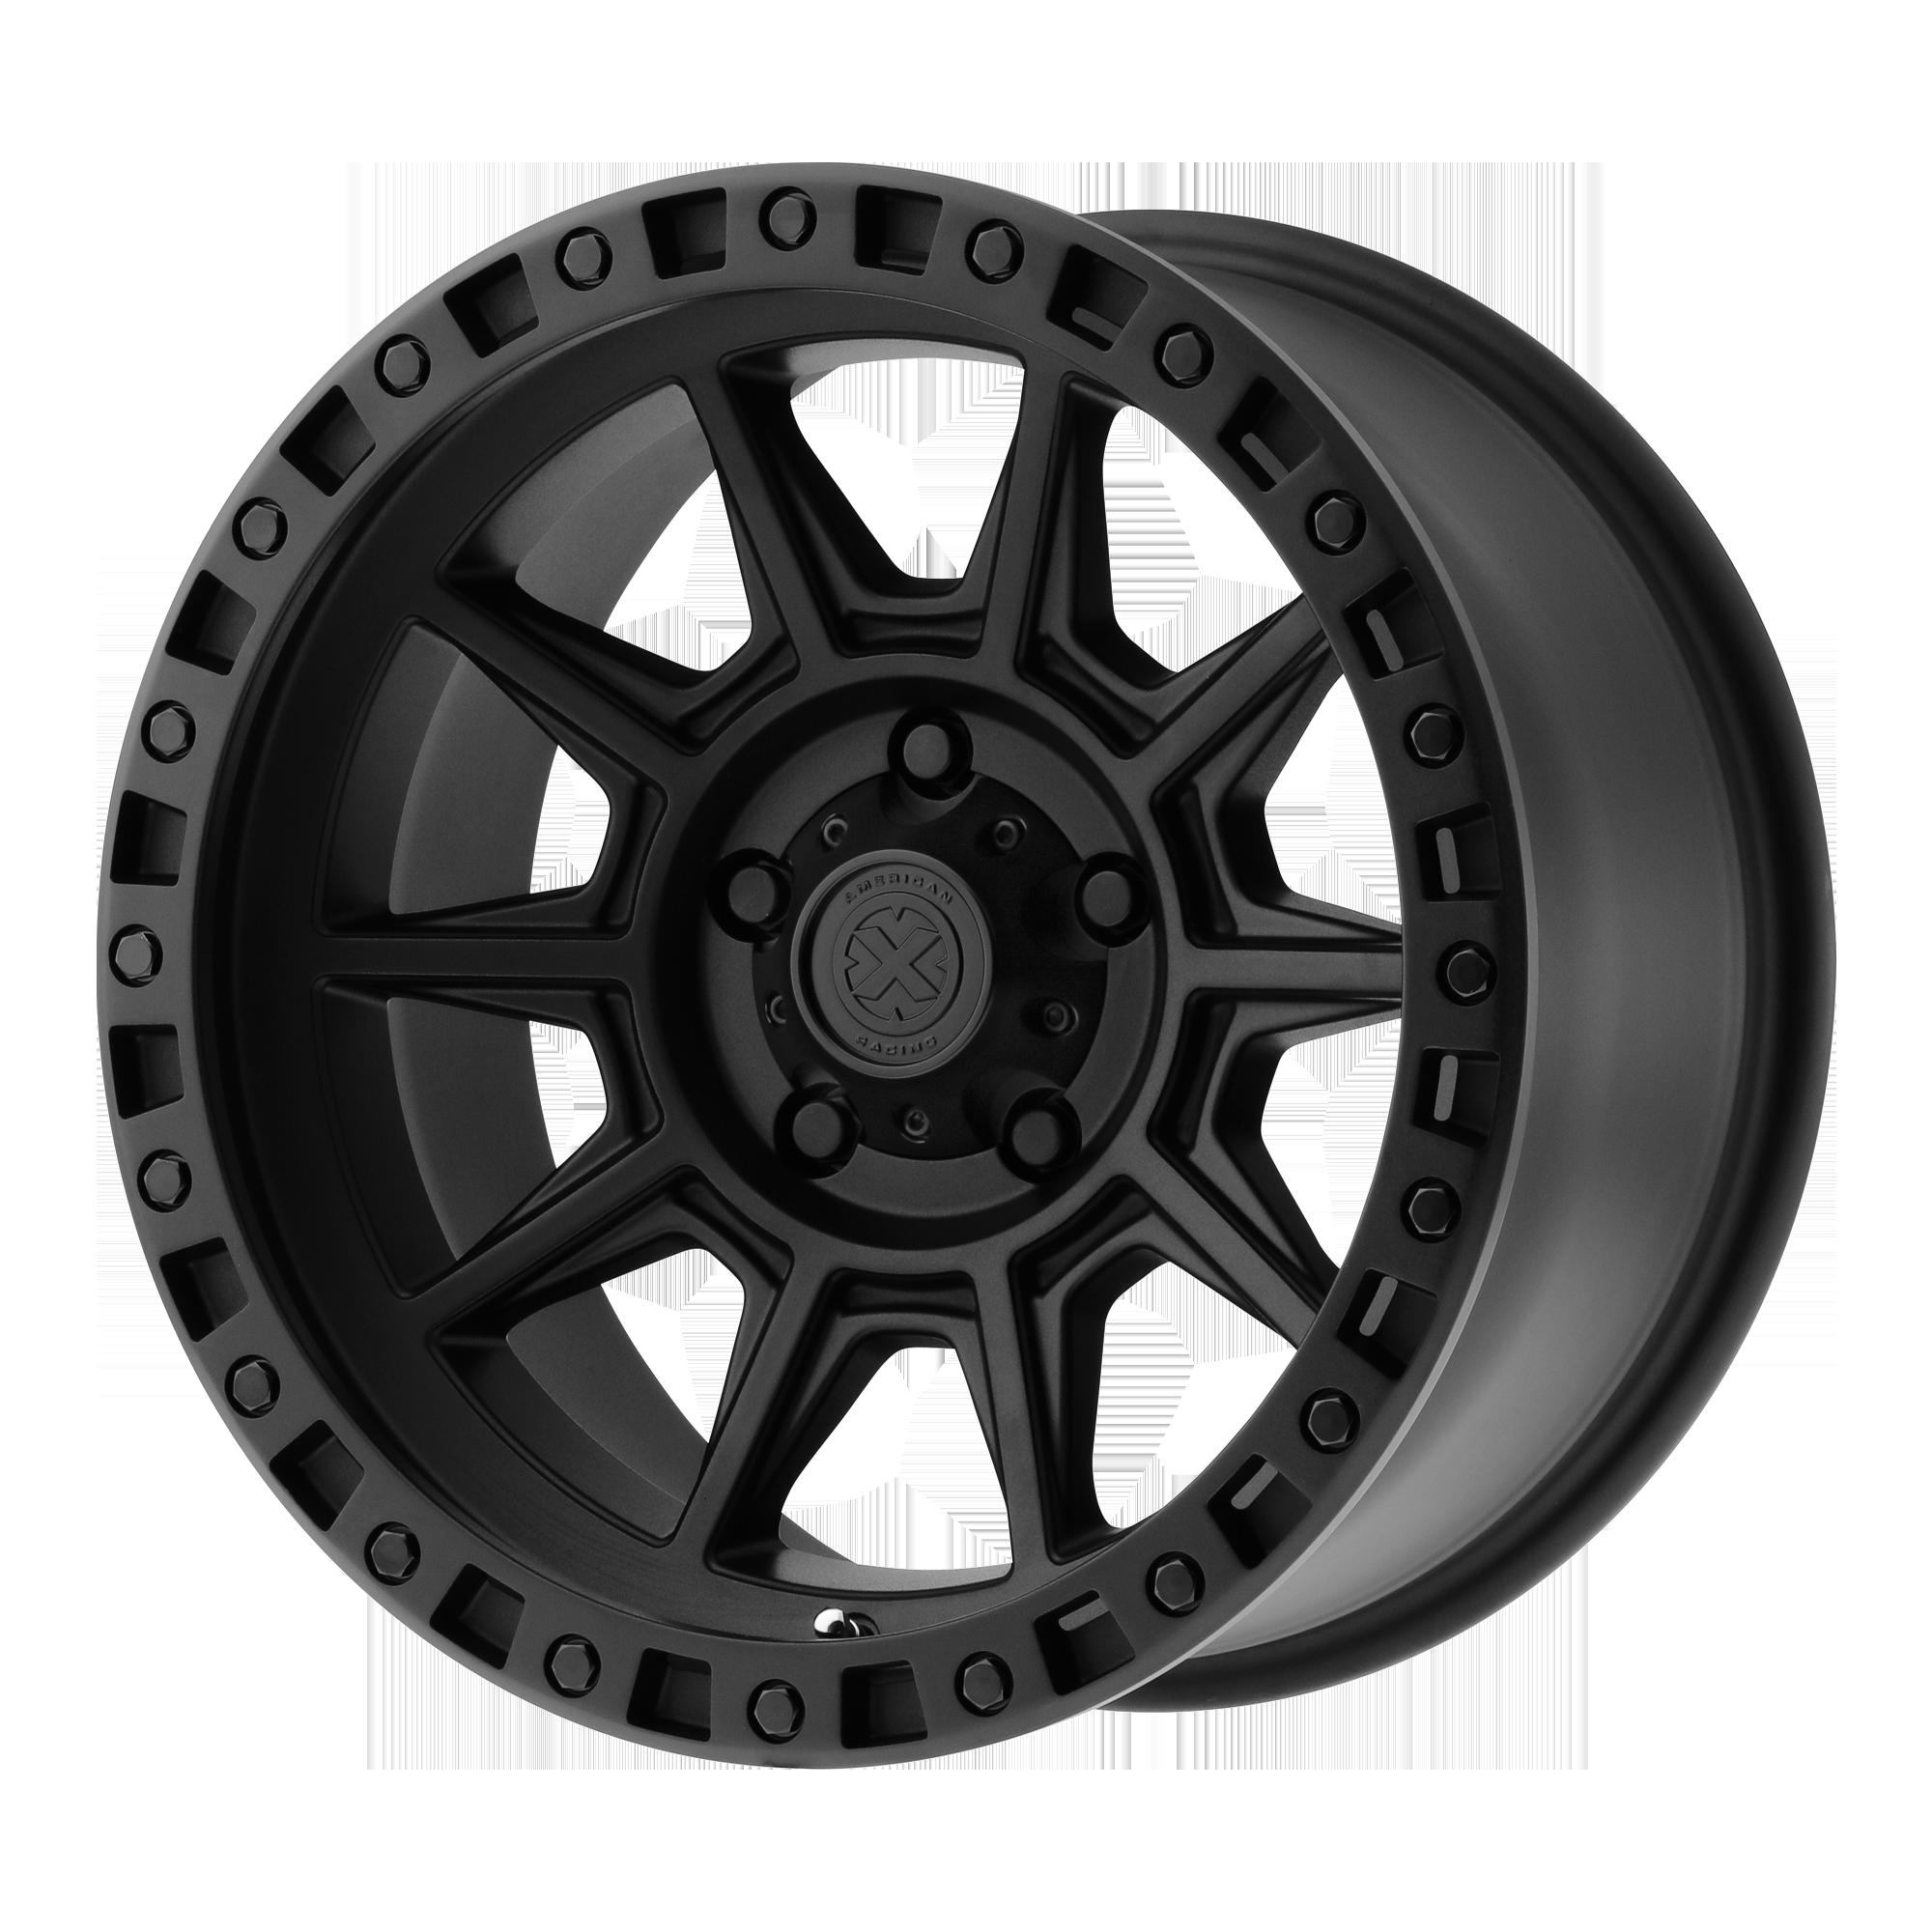 ATX SERIES AX202 hliníkové disky 9x17 8x170 ET-12 Cast Iron Black